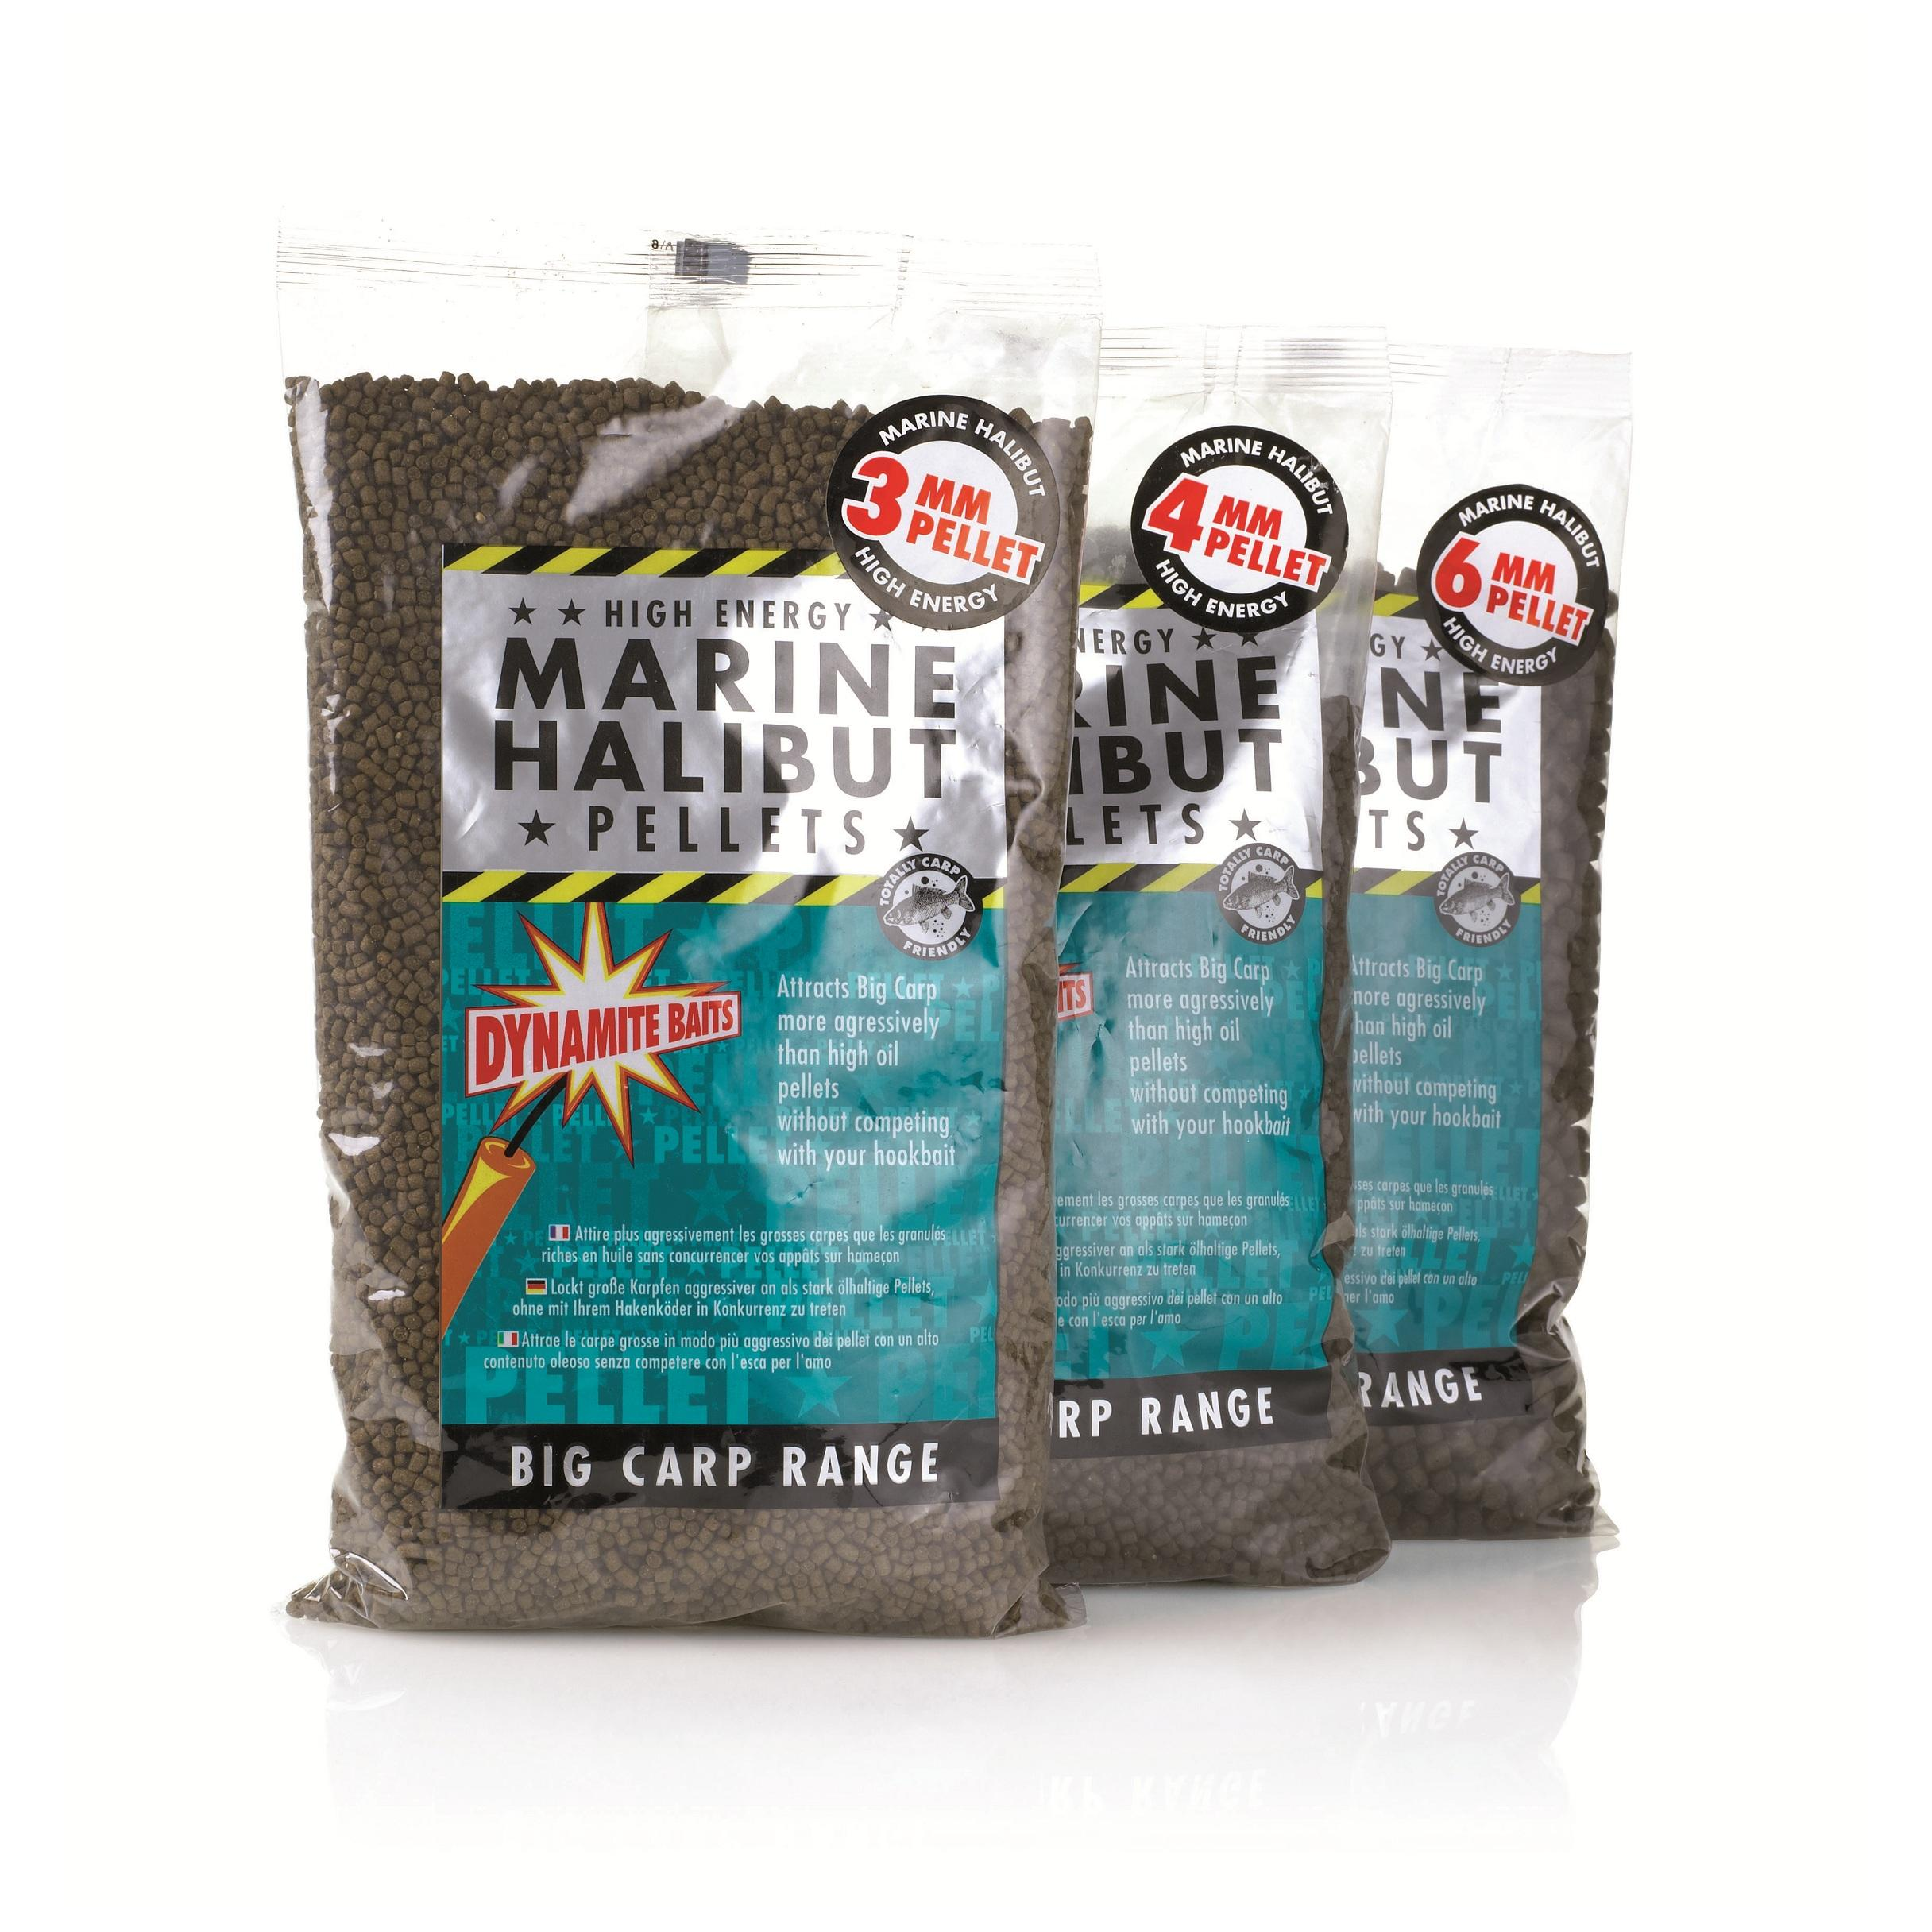 Brand New Dynamite Marine Halibut Pellets  ALL SIZES